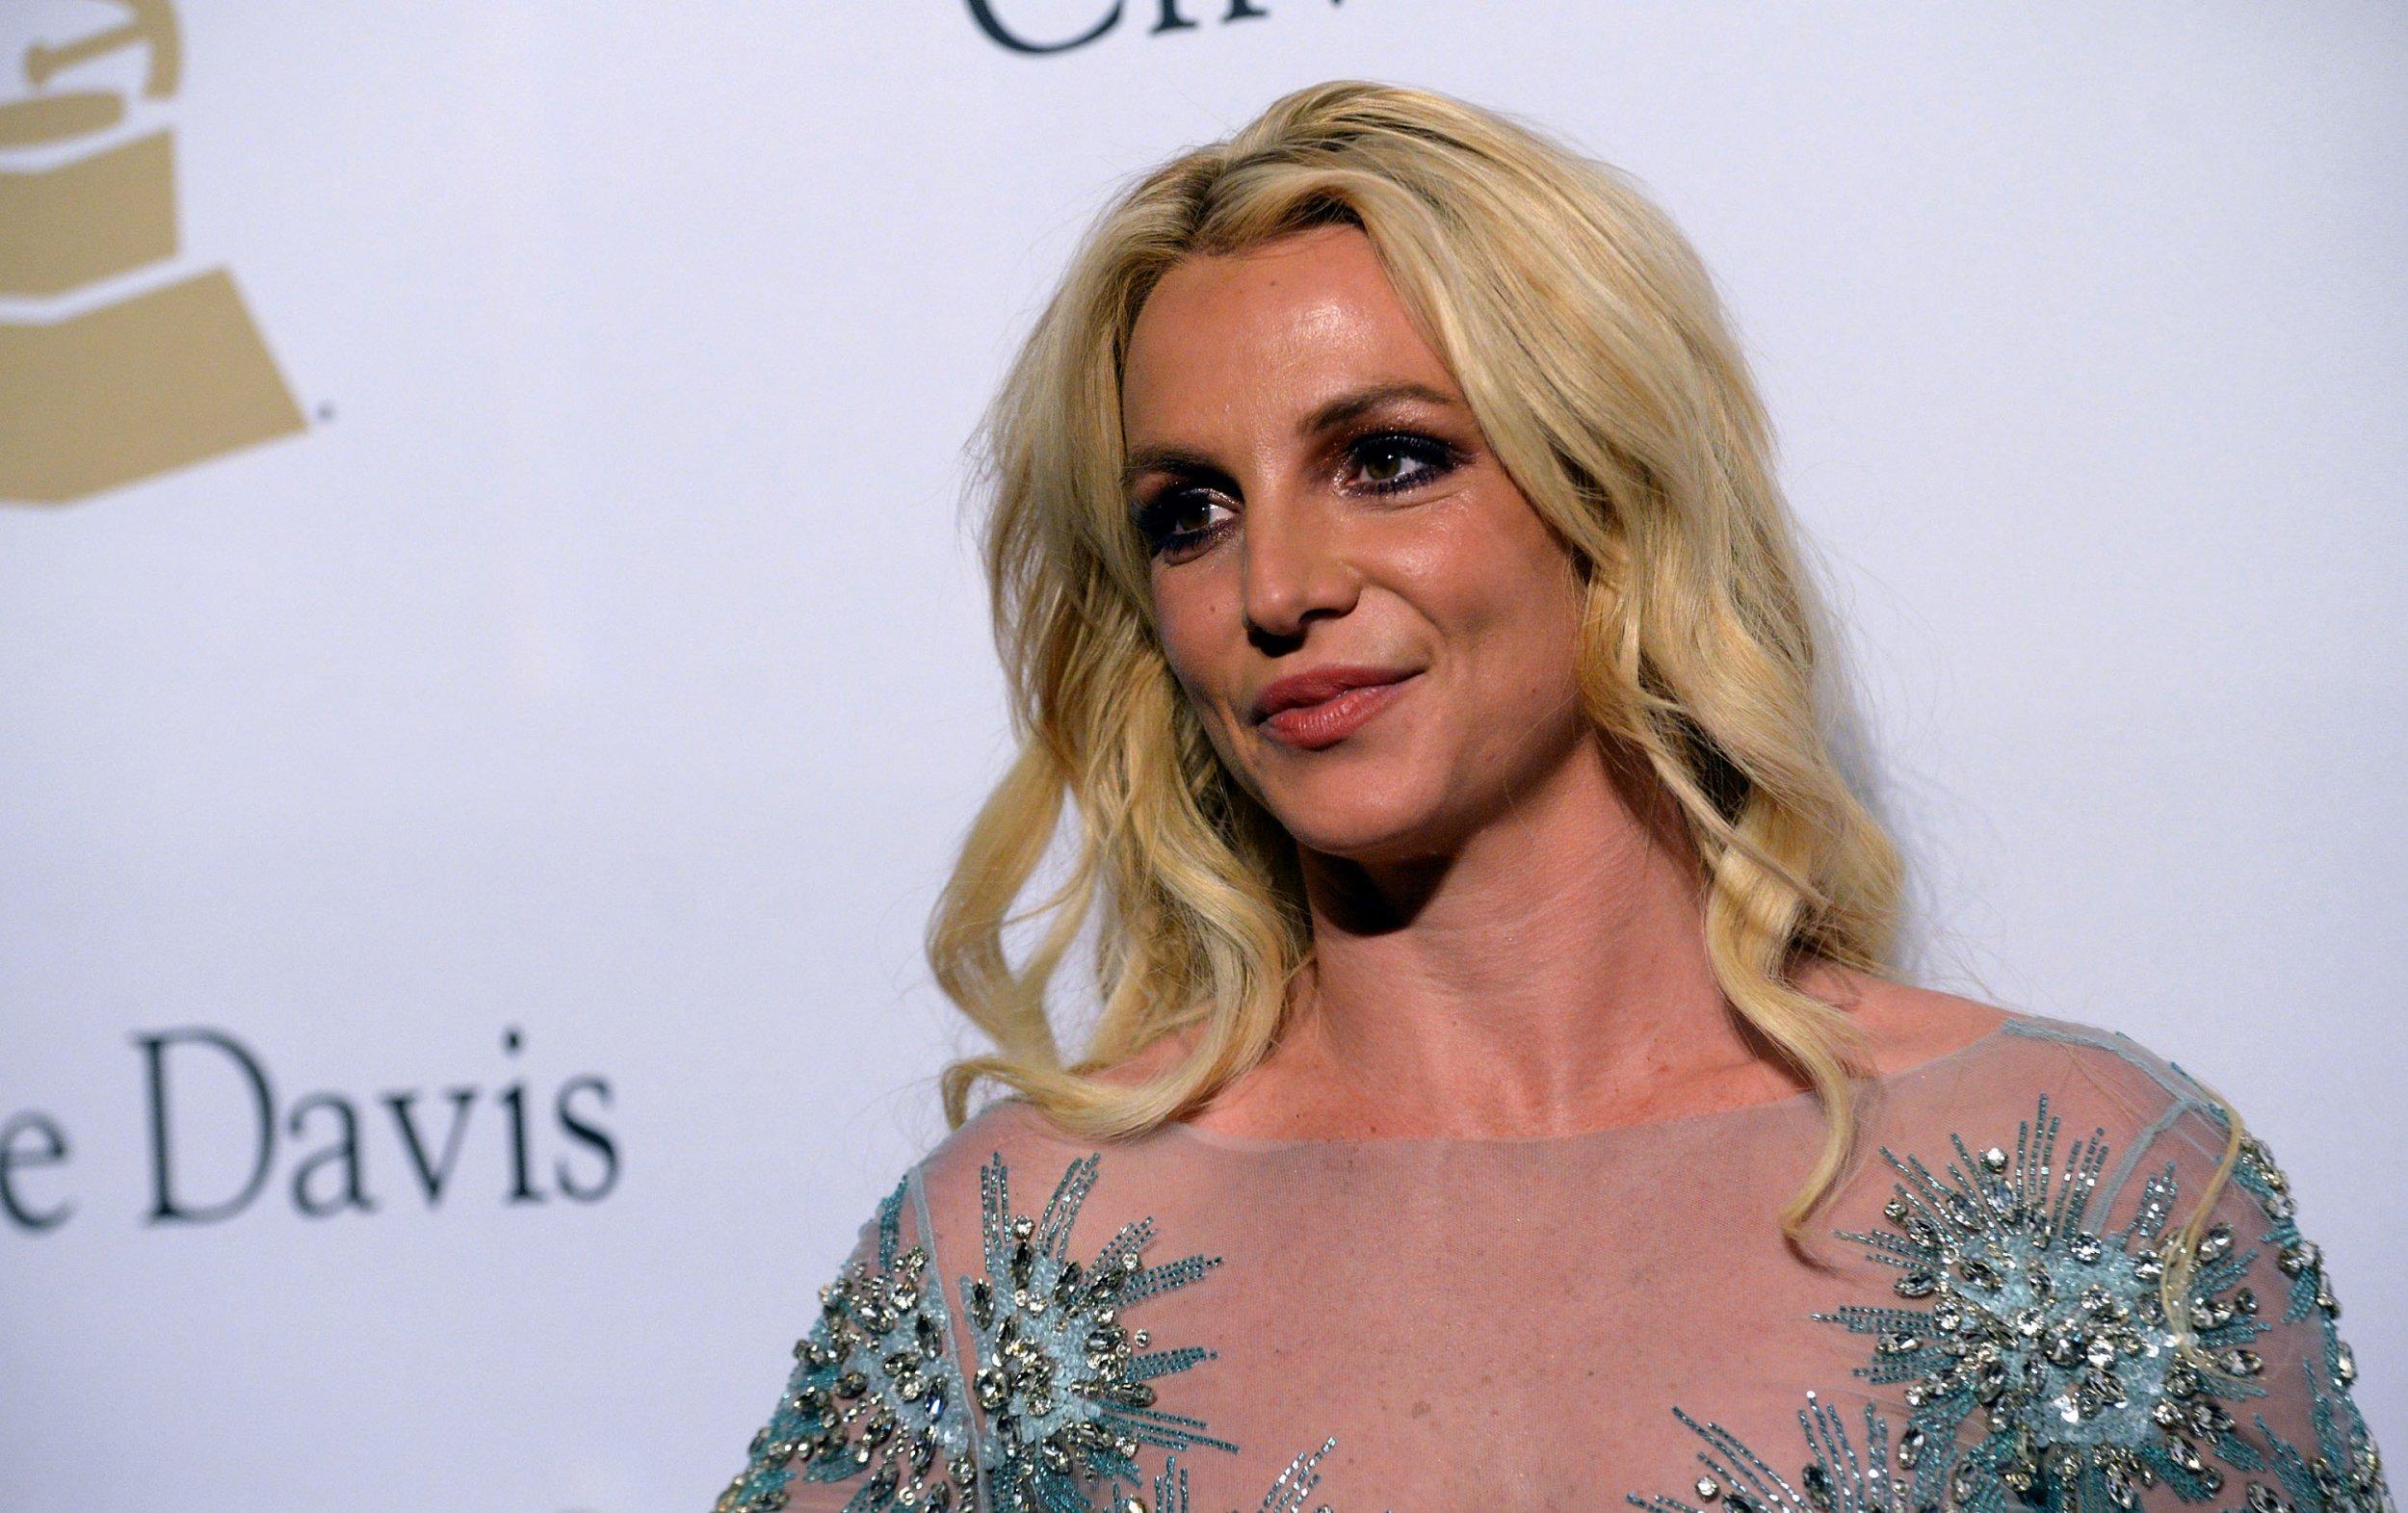 Chris Crocker Of 'Leave Britney Alone' Viral Video Advocates